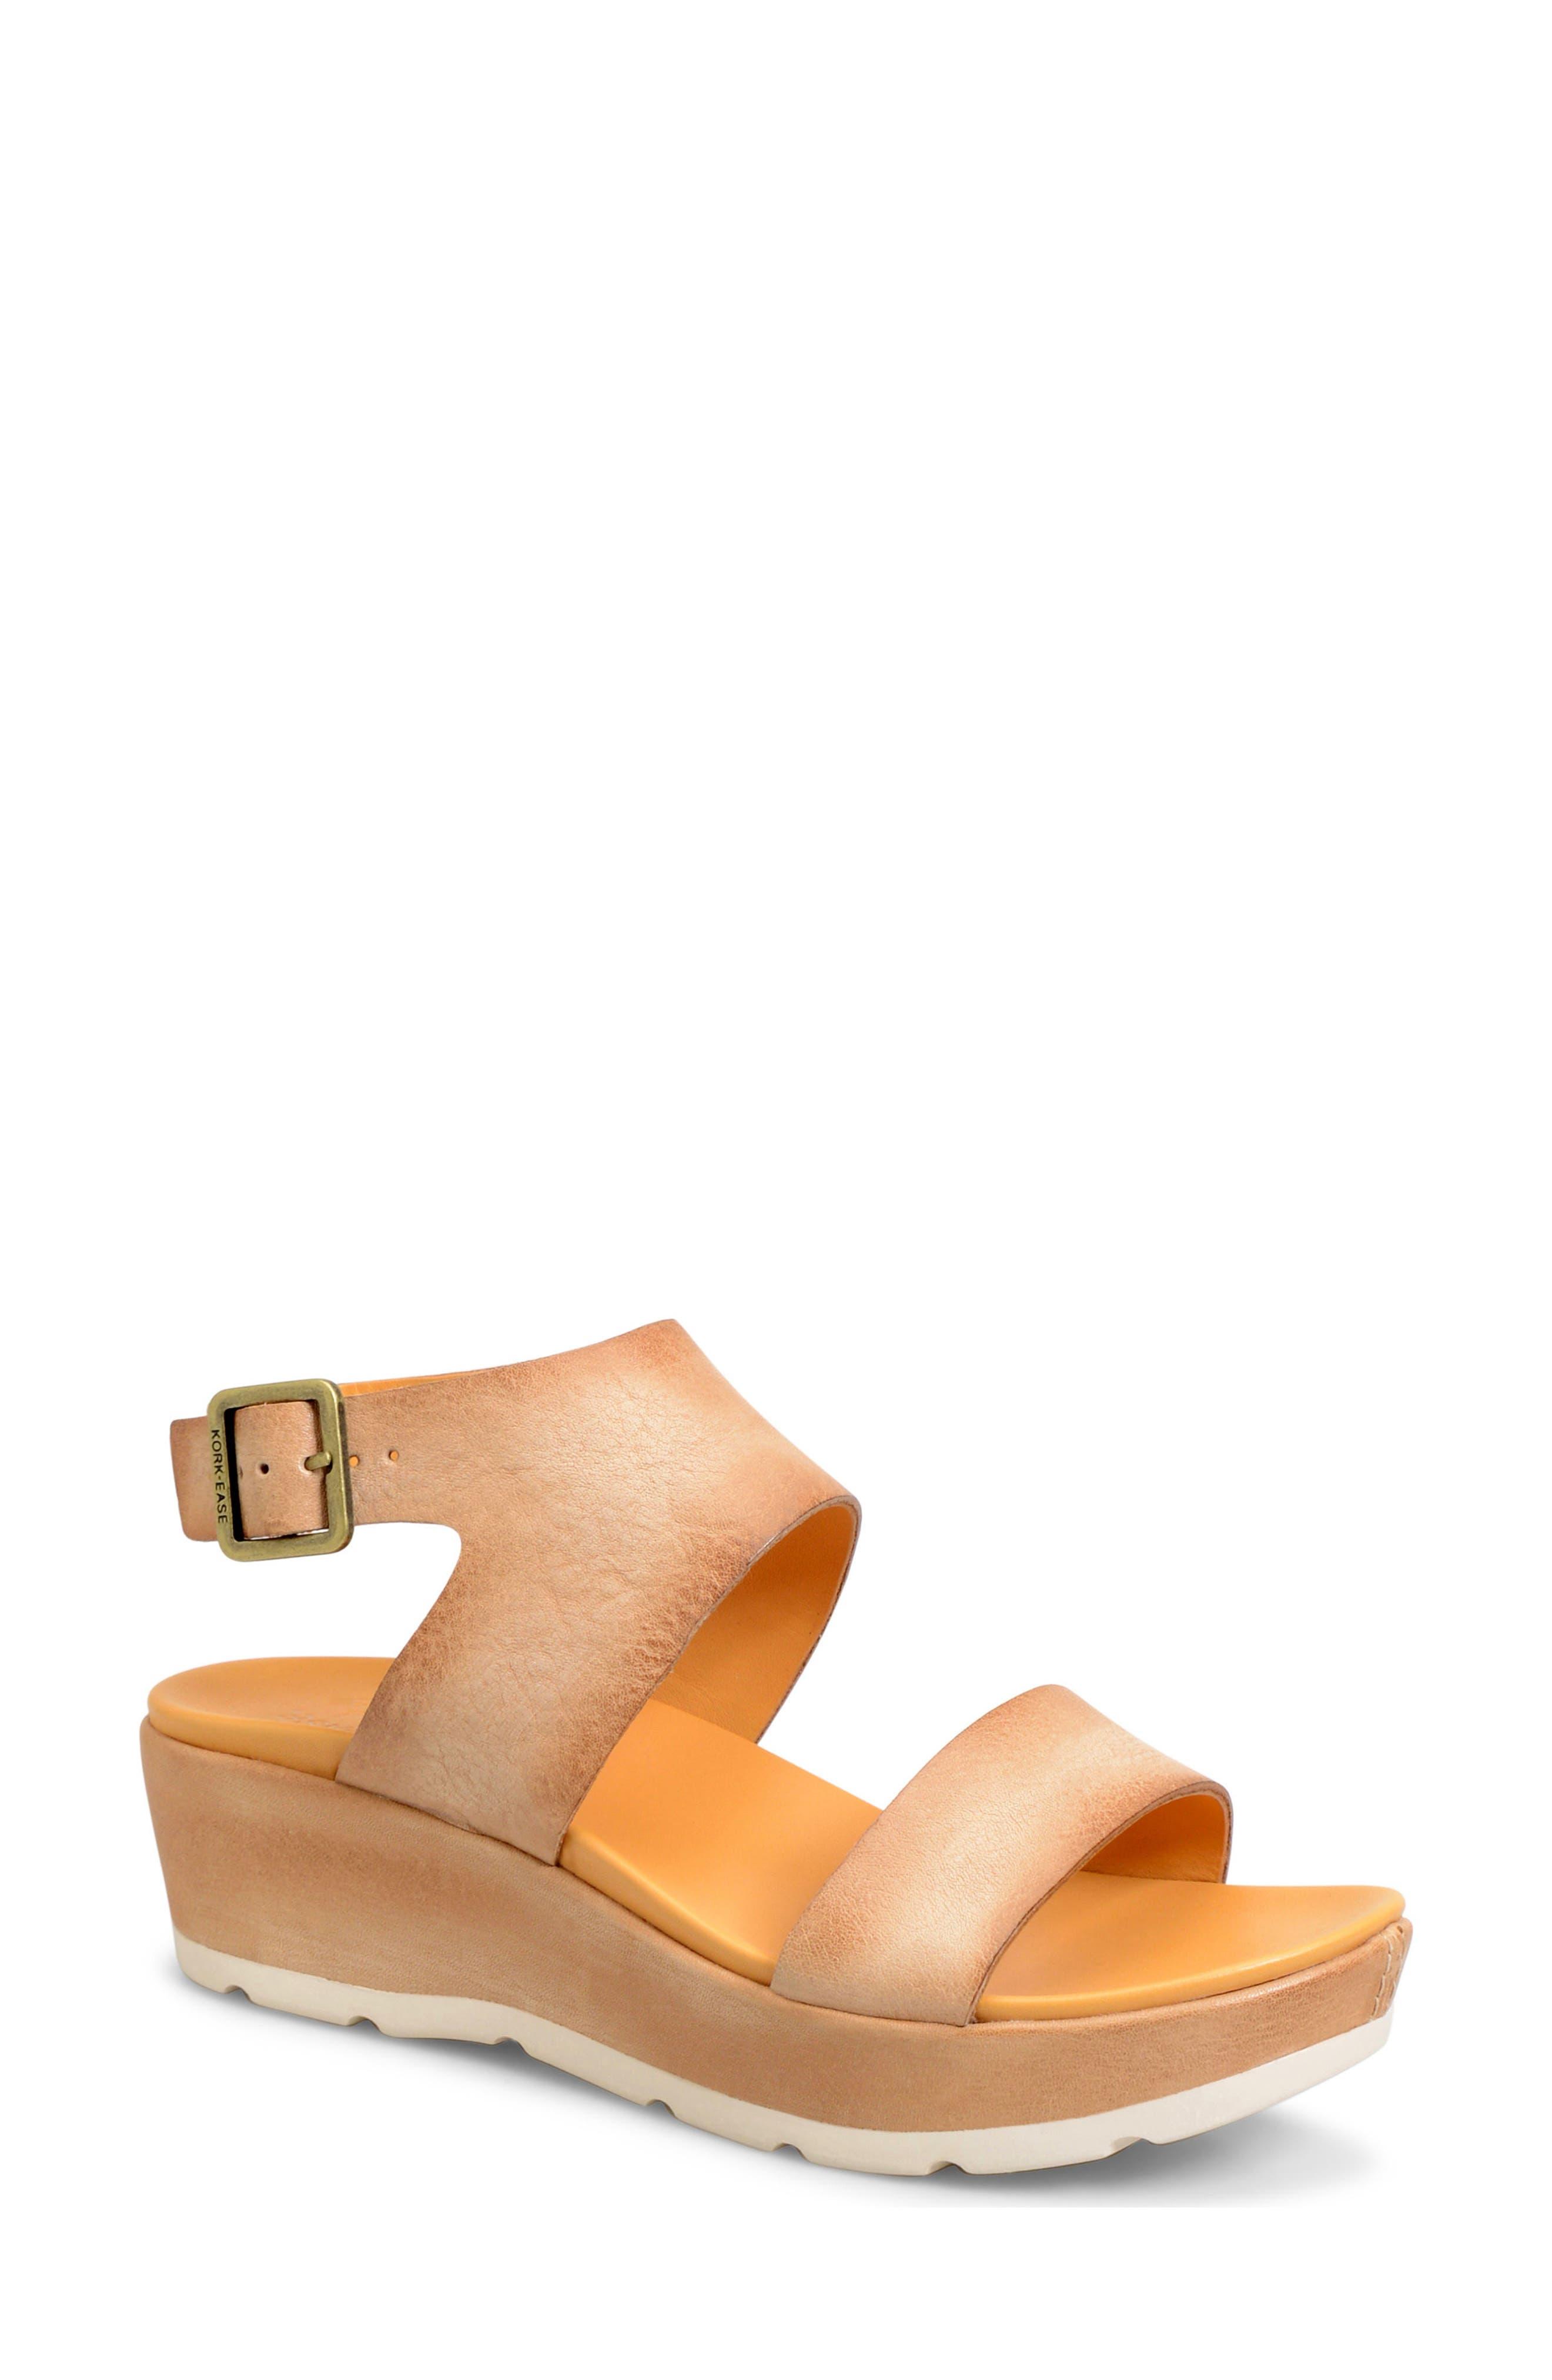 'Khloe' Platform Wedge Sandal,                             Main thumbnail 4, color,